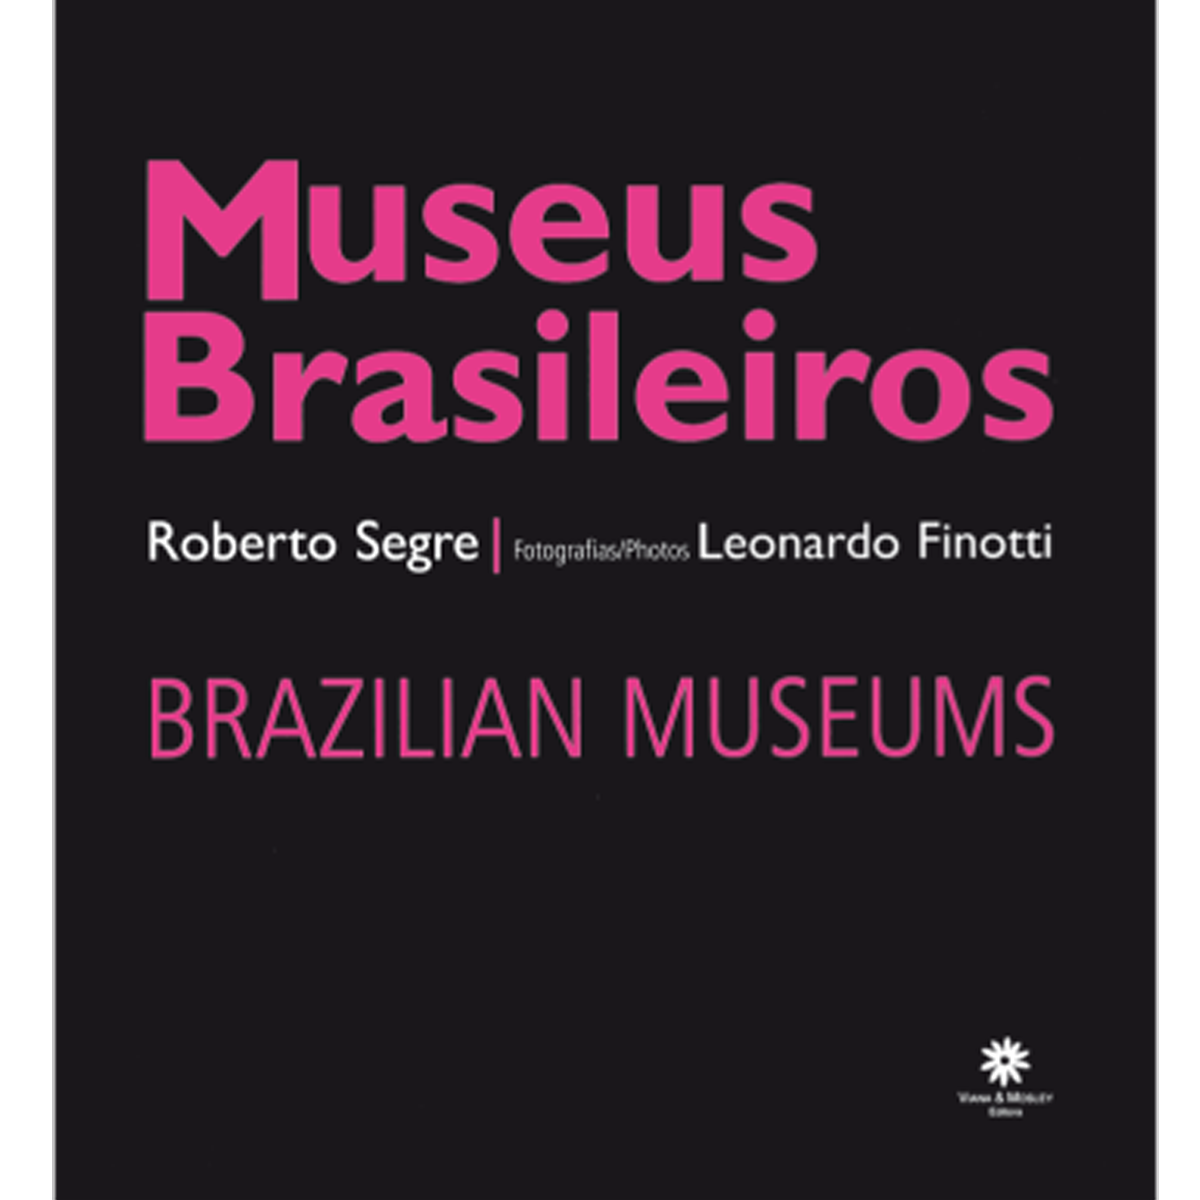 Brazilian Museums